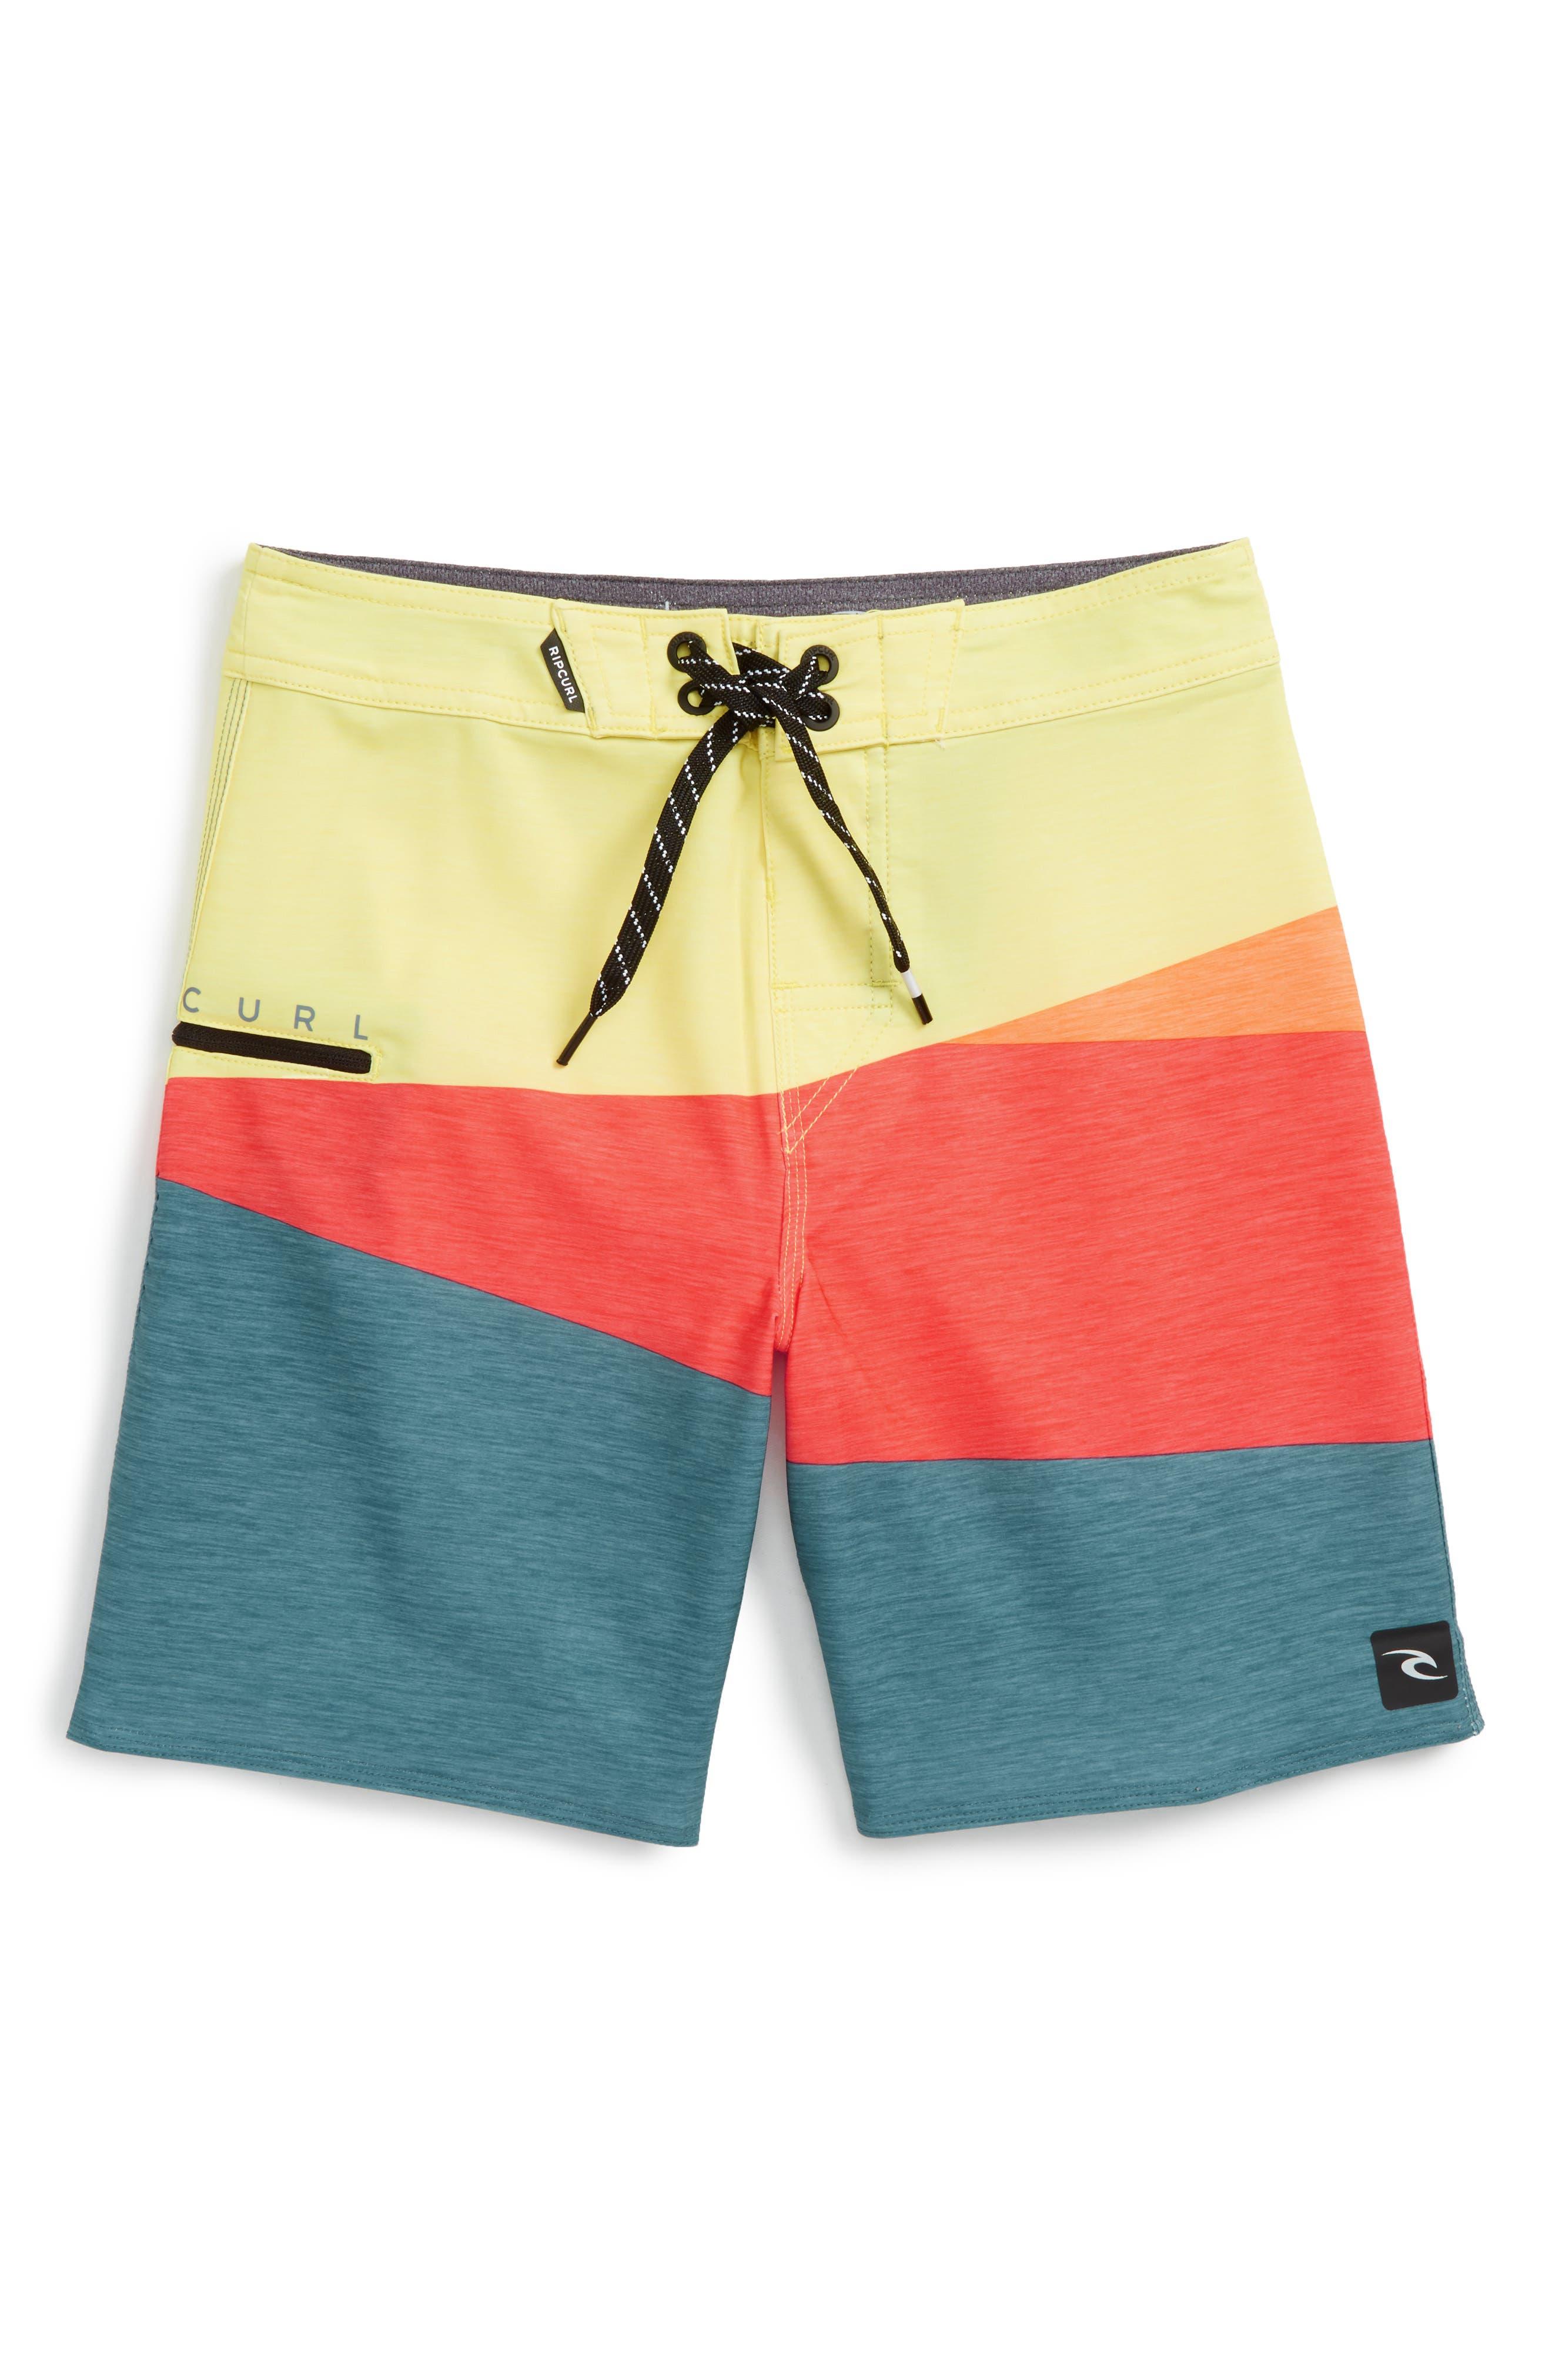 RIP CURL Mirage Wedge Board Shorts